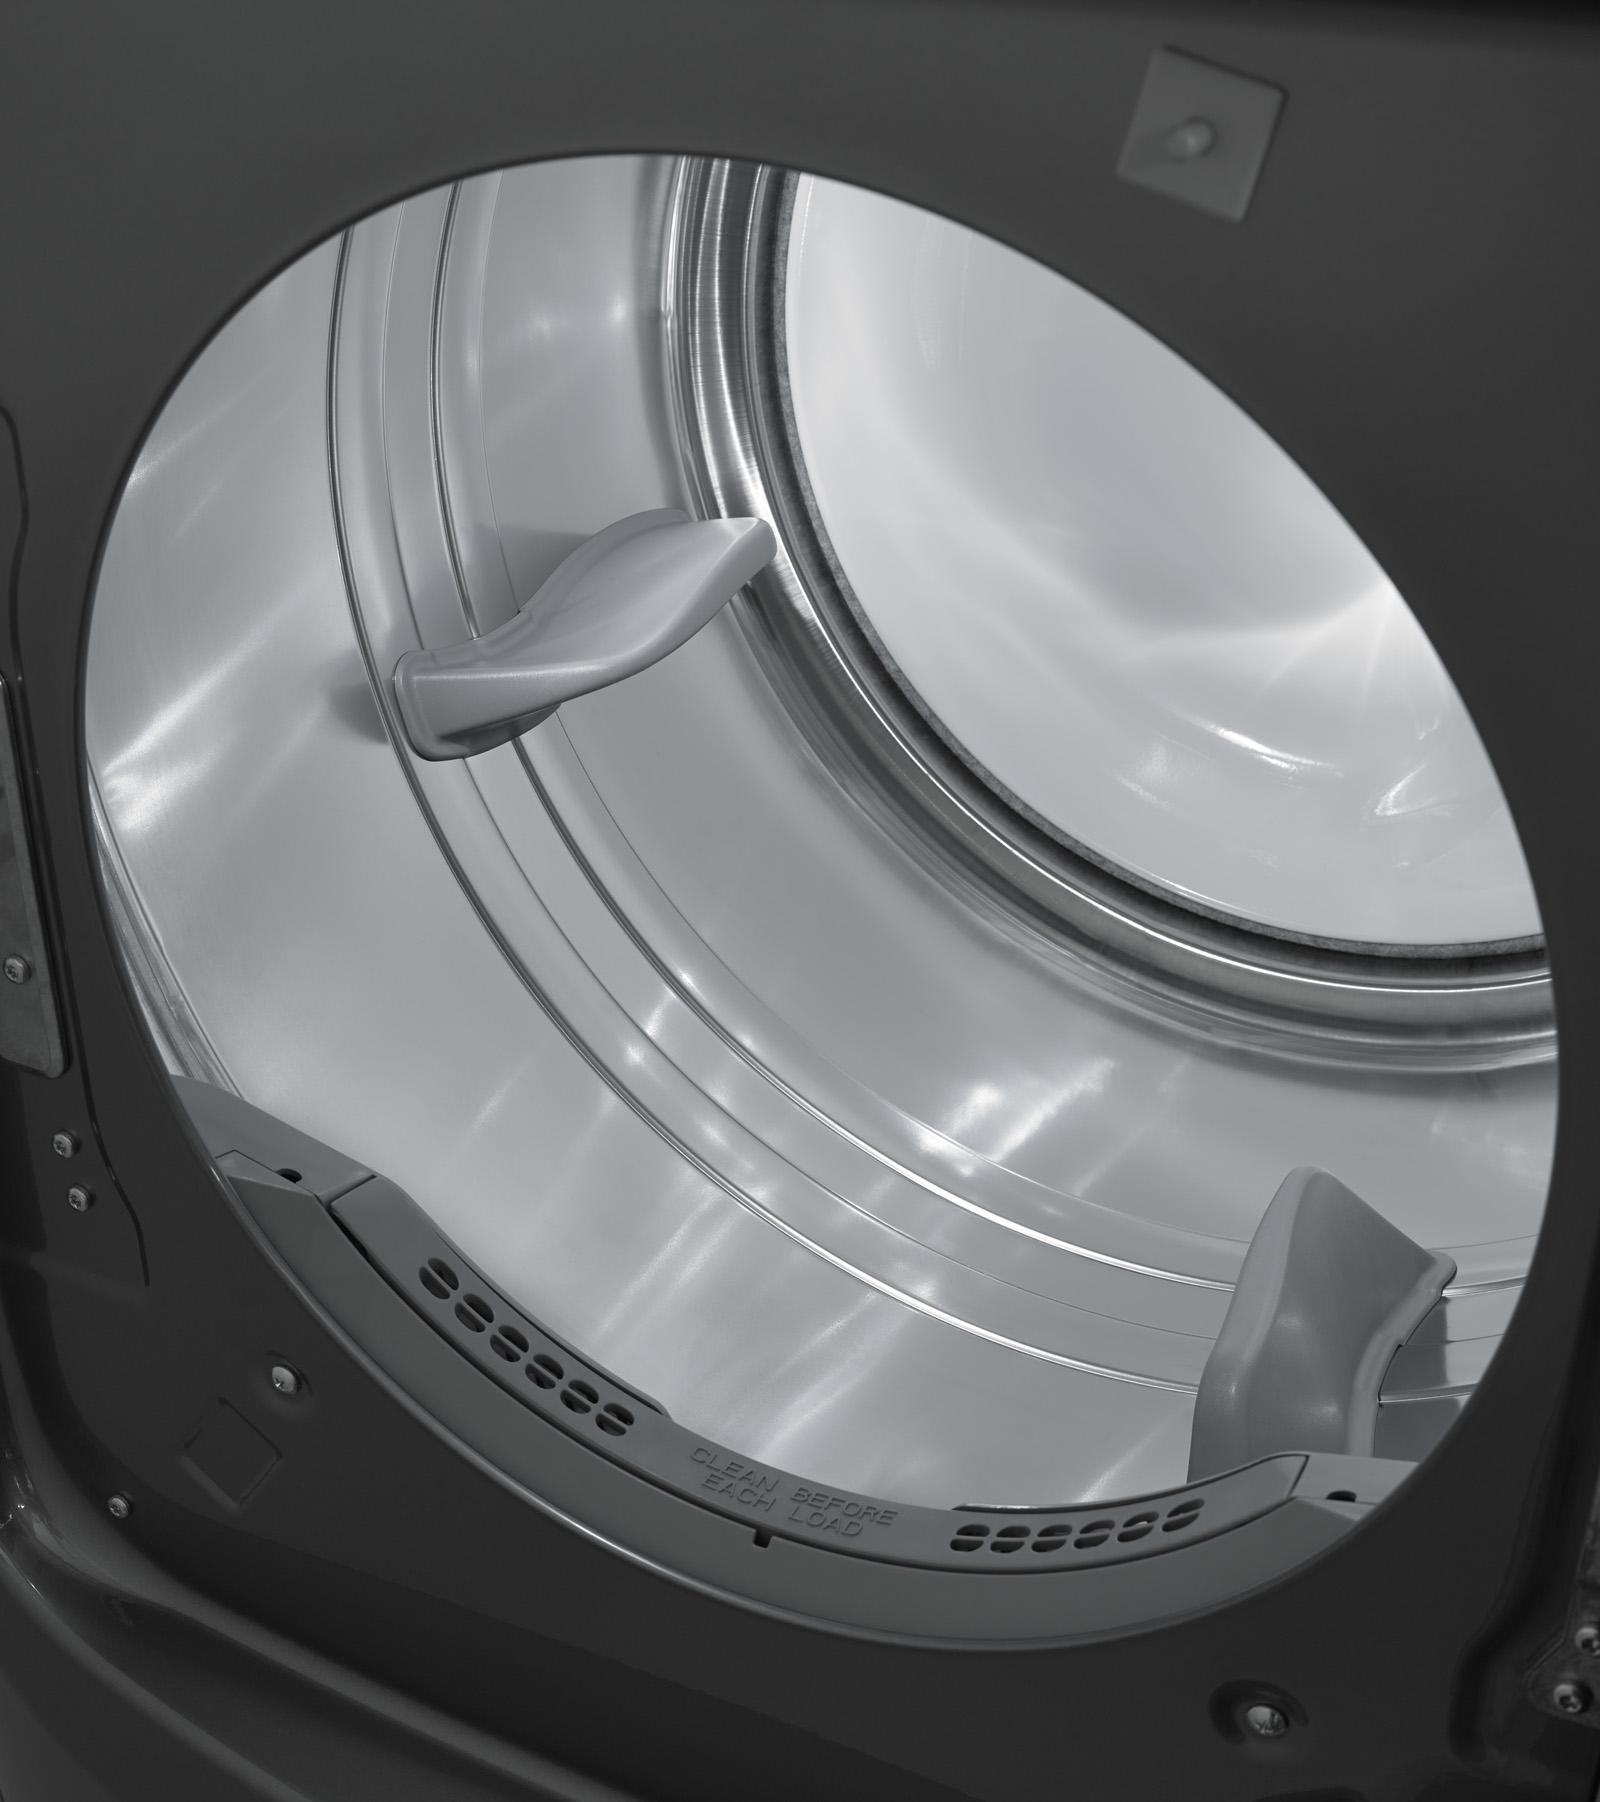 Maytag 7.4 cu. ft. Maxima® Gas Dryer w/ Stainless Steel Drum - Metallic Slate